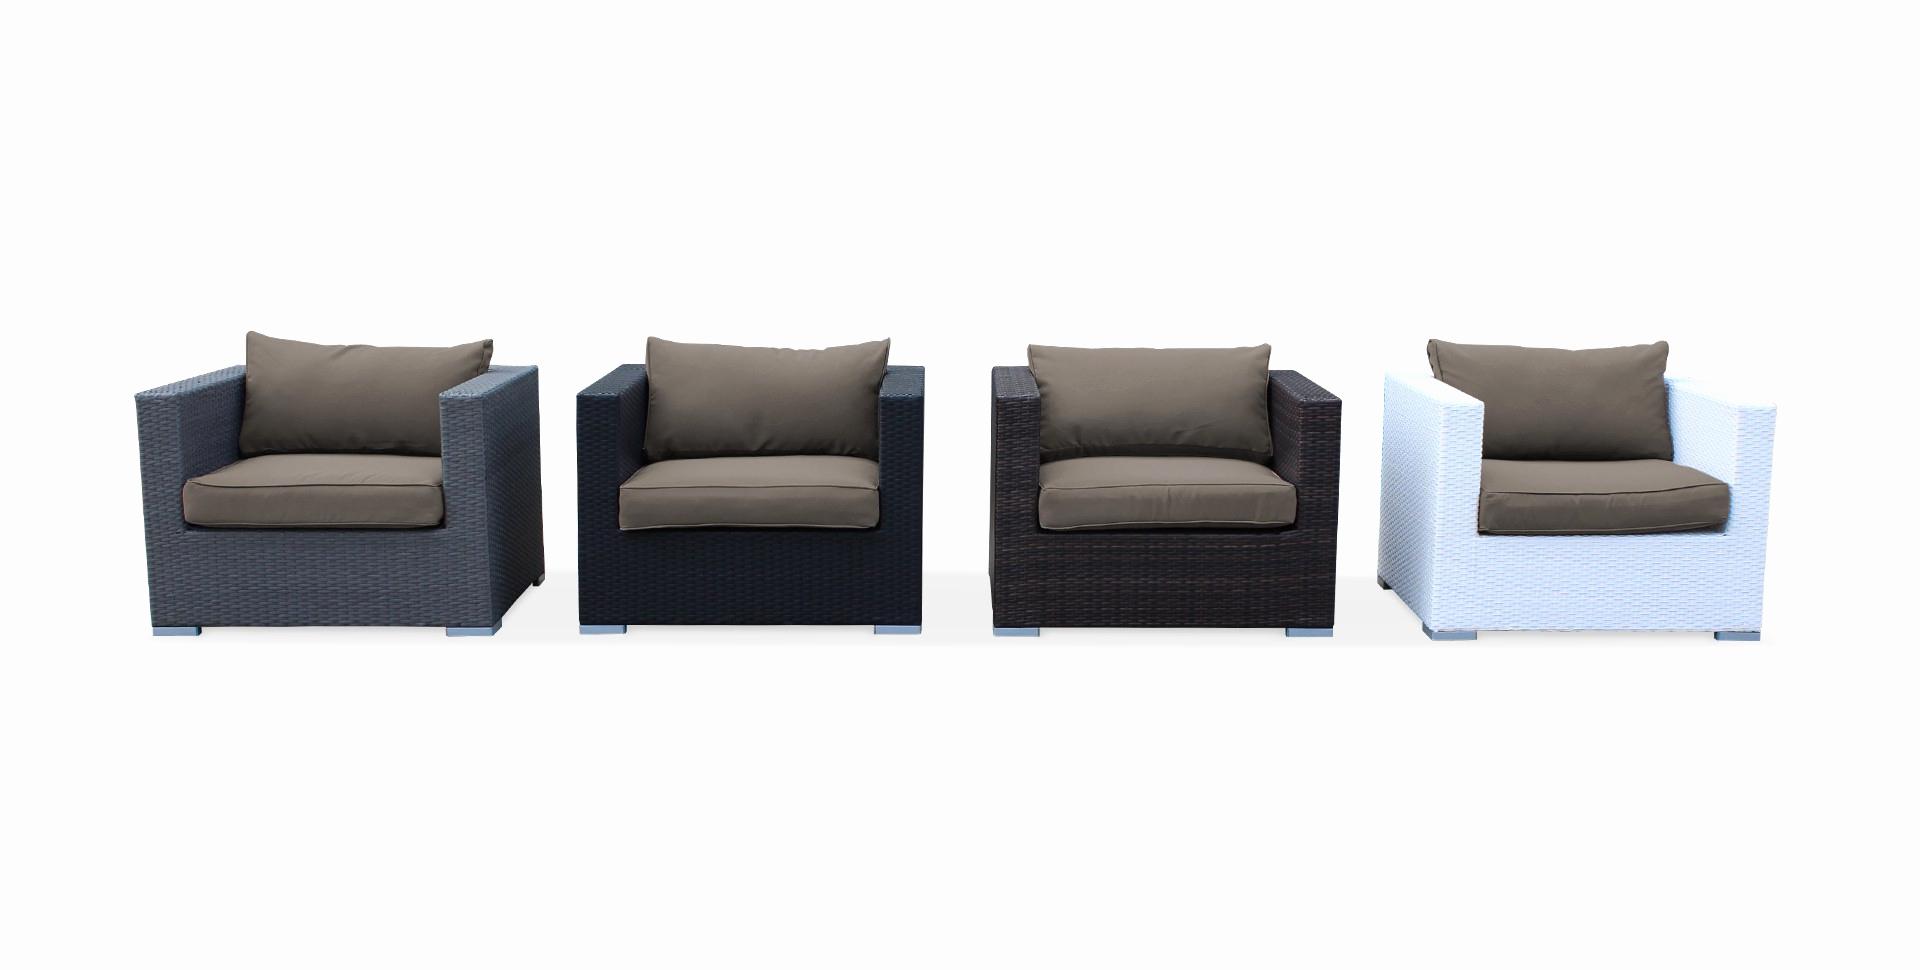 coussin pour salon de jardin riverside jardin. Black Bedroom Furniture Sets. Home Design Ideas